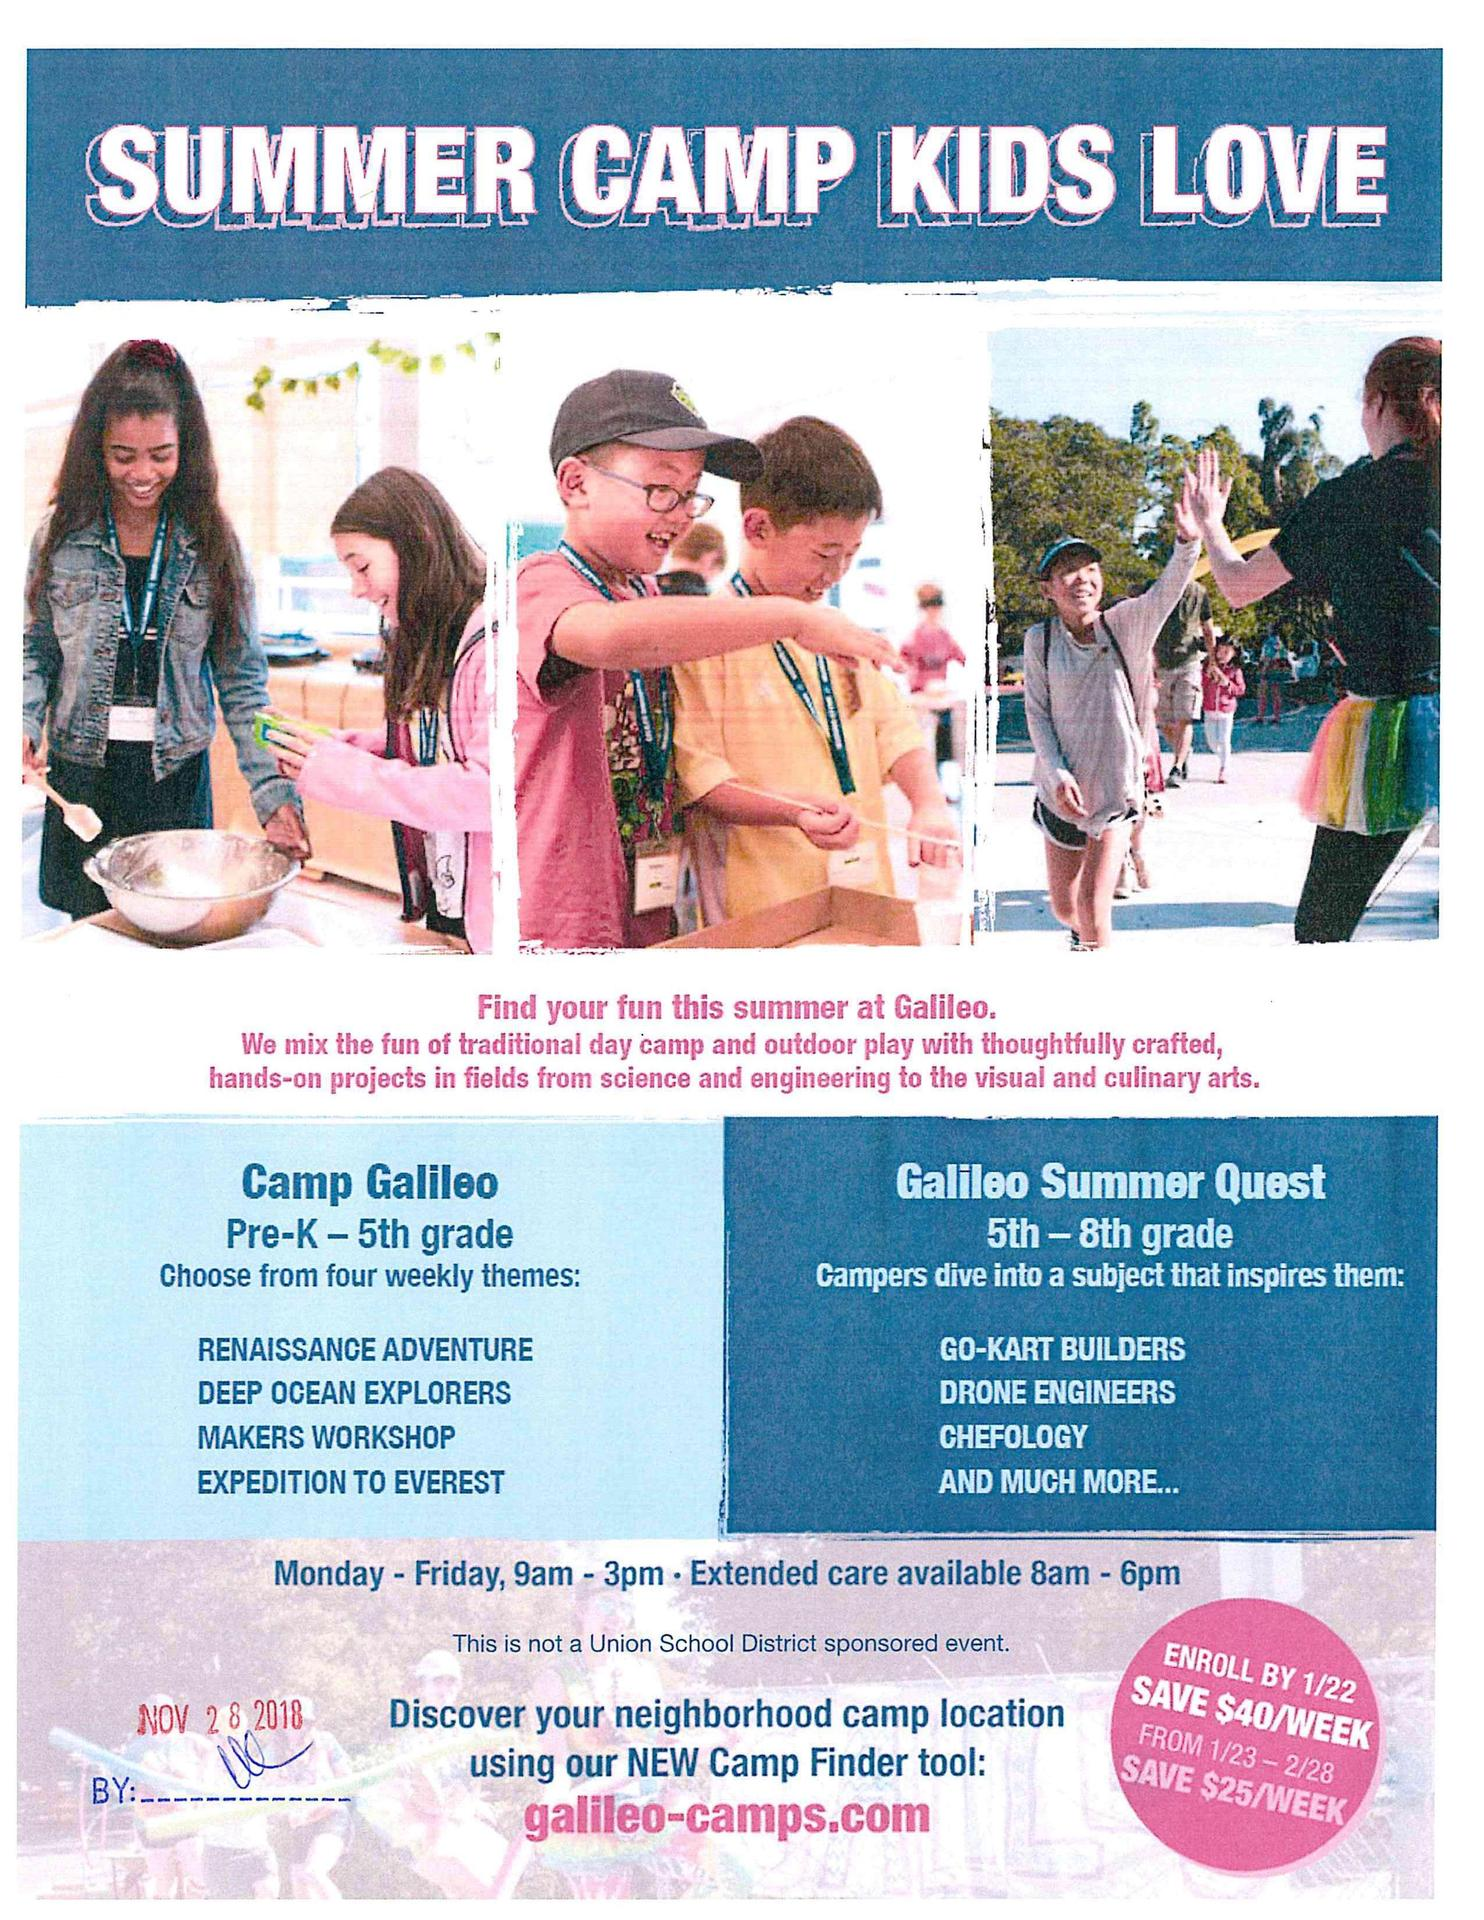 Galileo Summer Camp